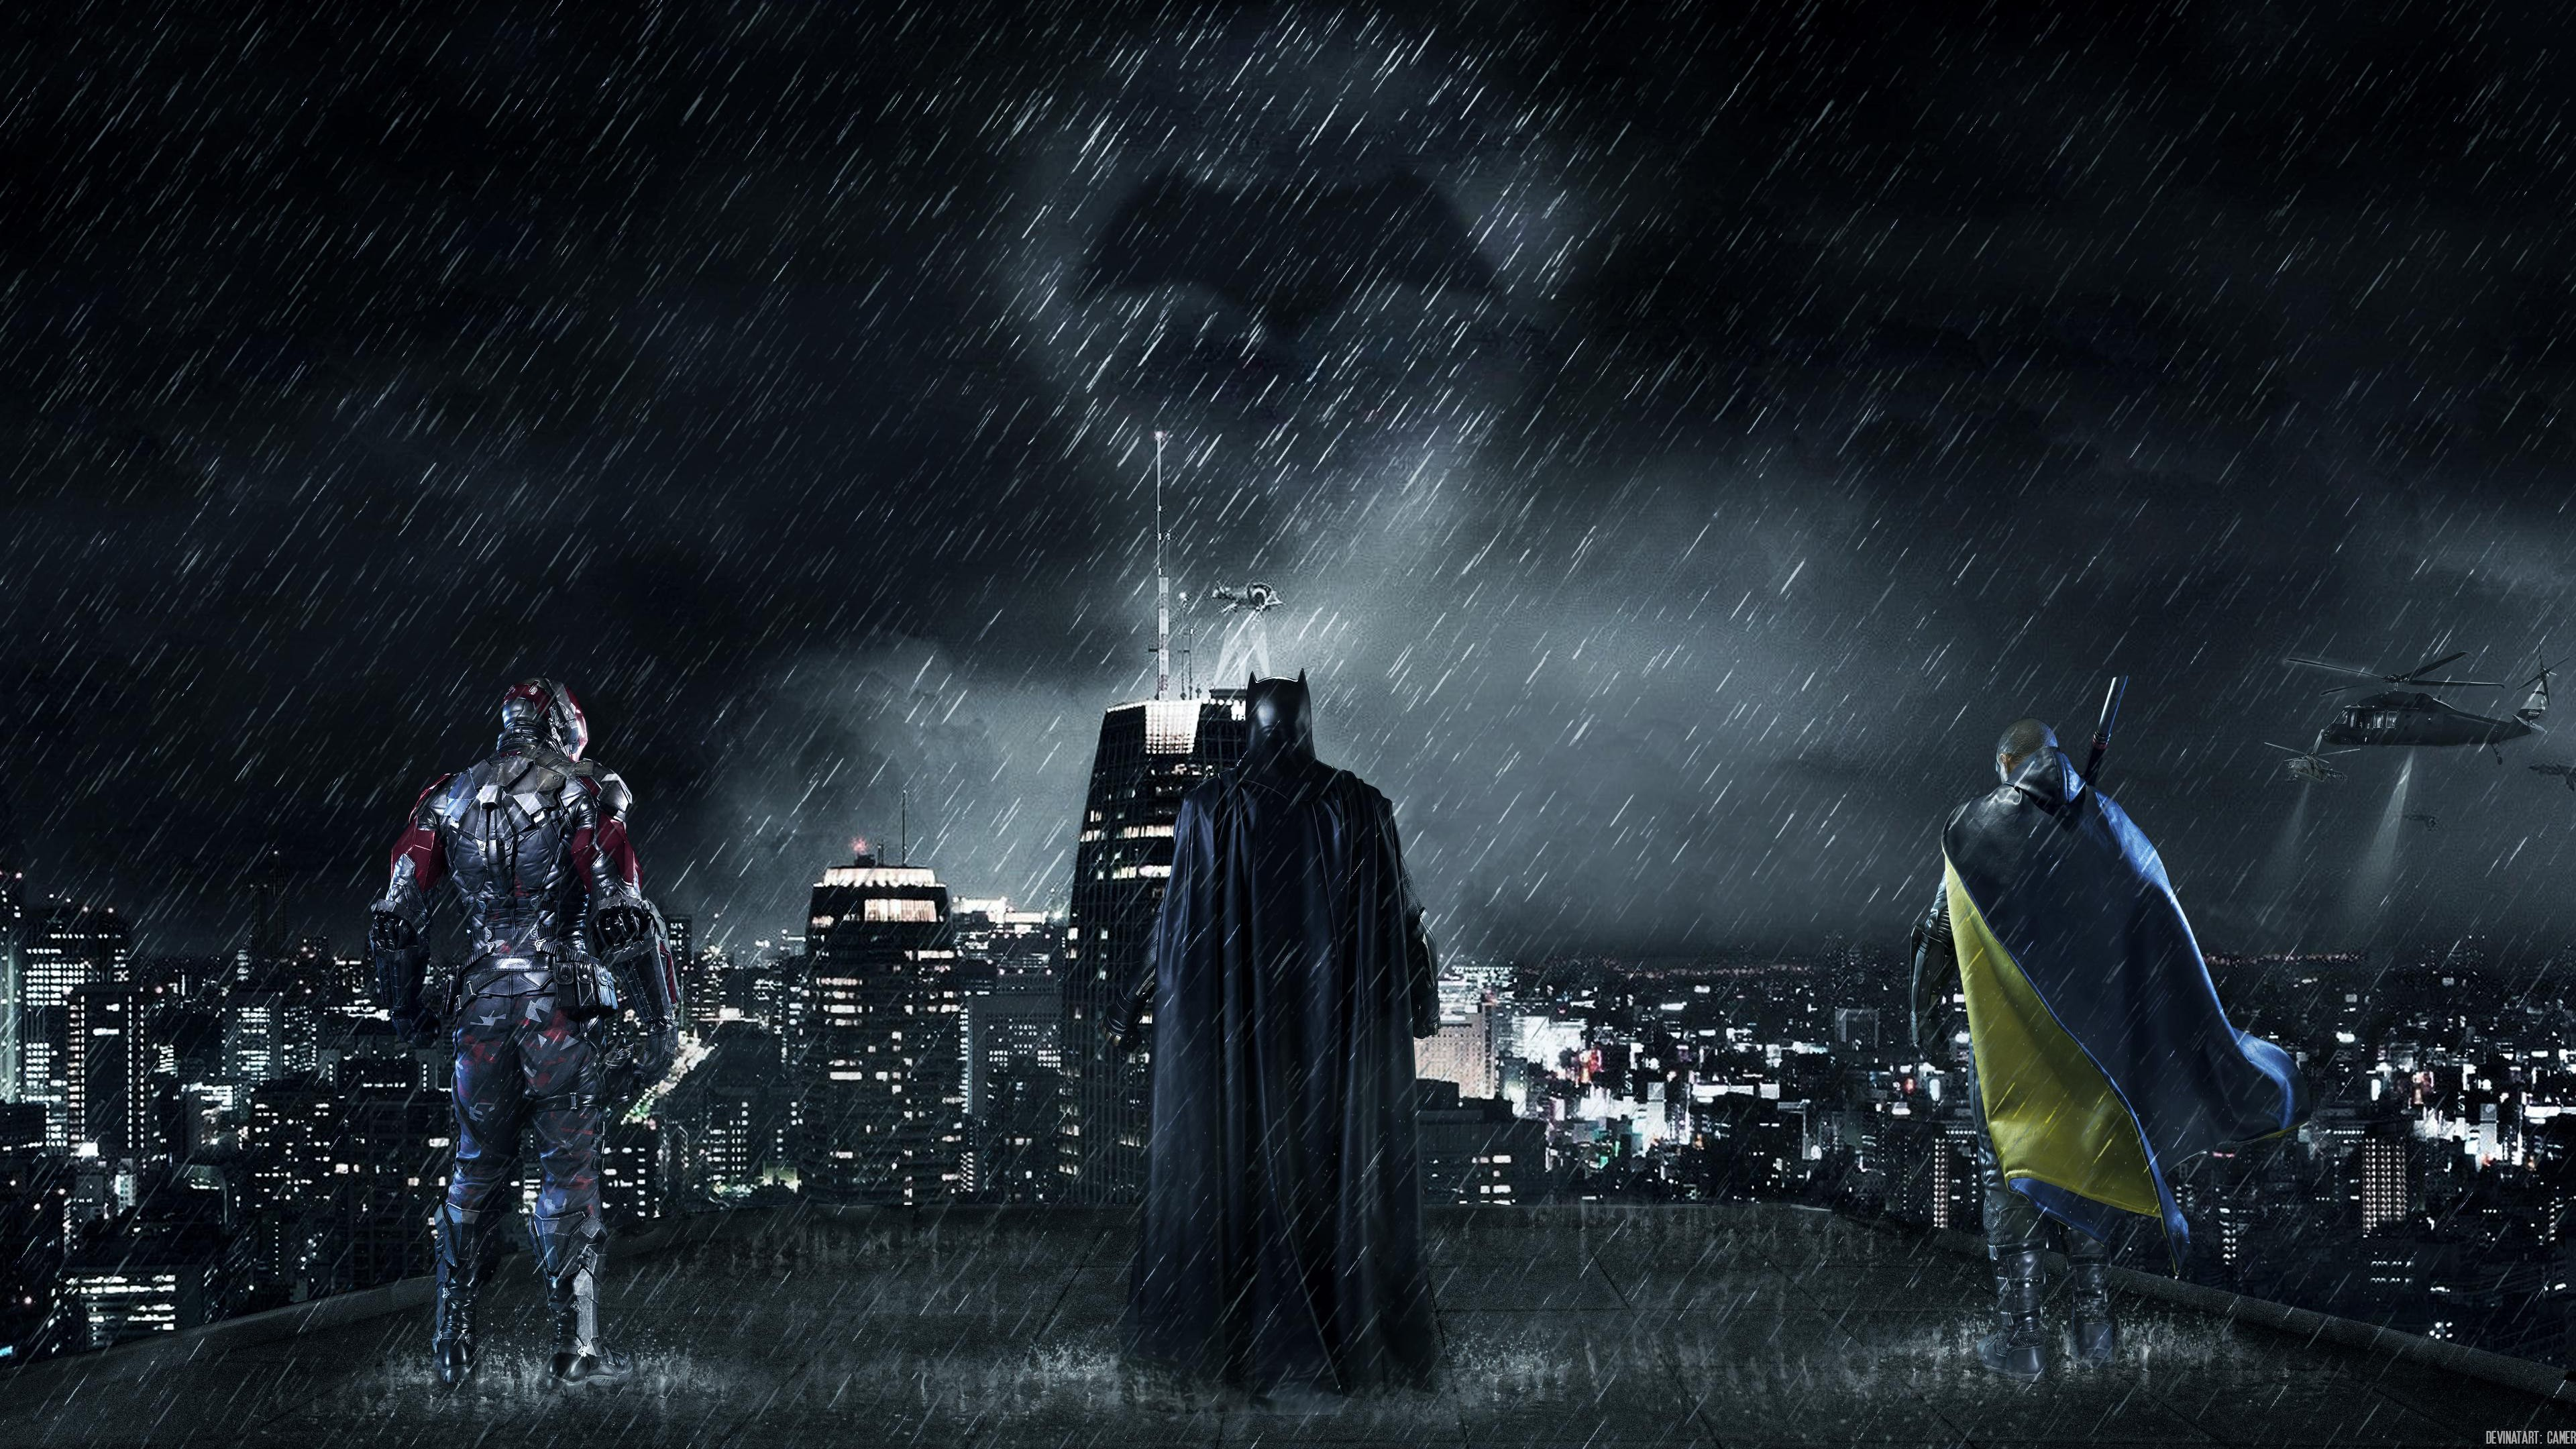 59+ Batman Wallpapers ·① Download Free Cool High